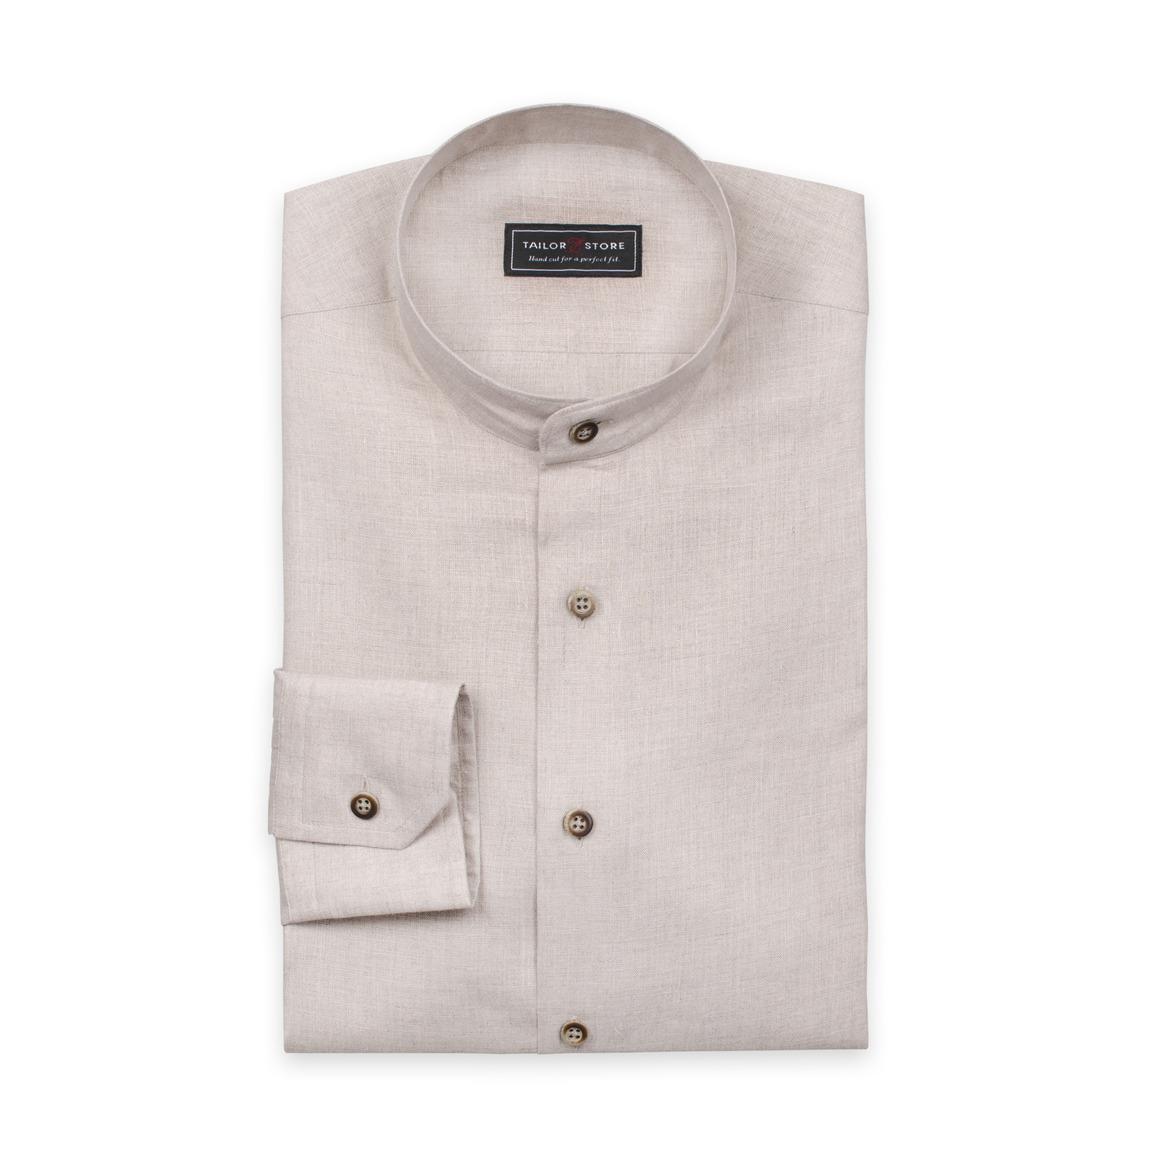 Sand colored linen shirt